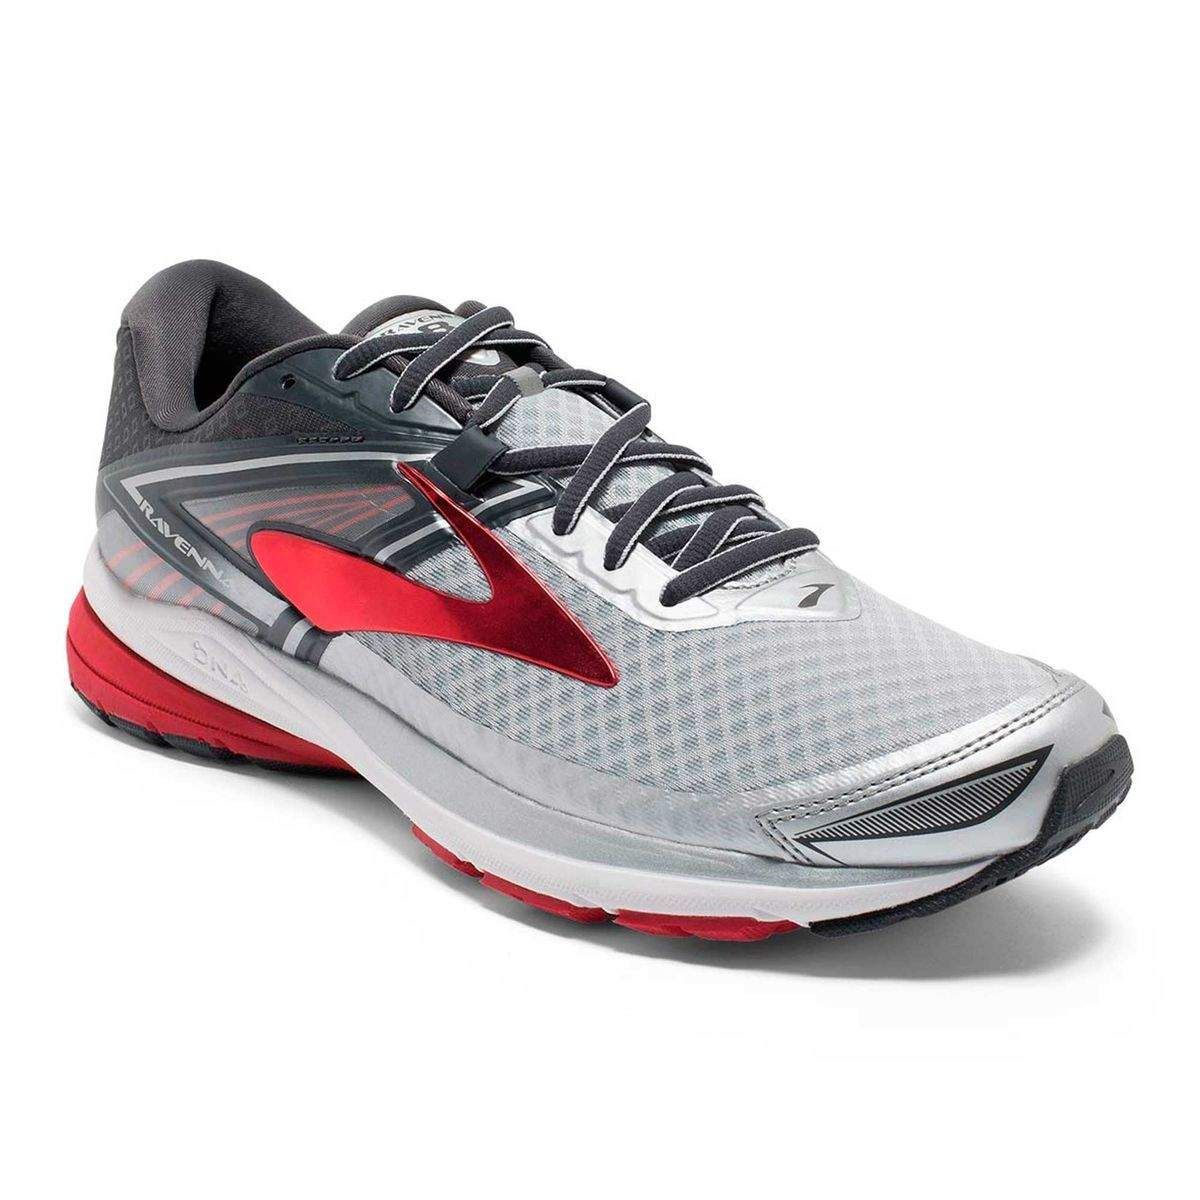 Motion Control Shoes for Walking - Top Picks Brooks Women's Adrenaline ASR  11 GTX Running Shoes Men's Neutral & Cushioning Running Shoes